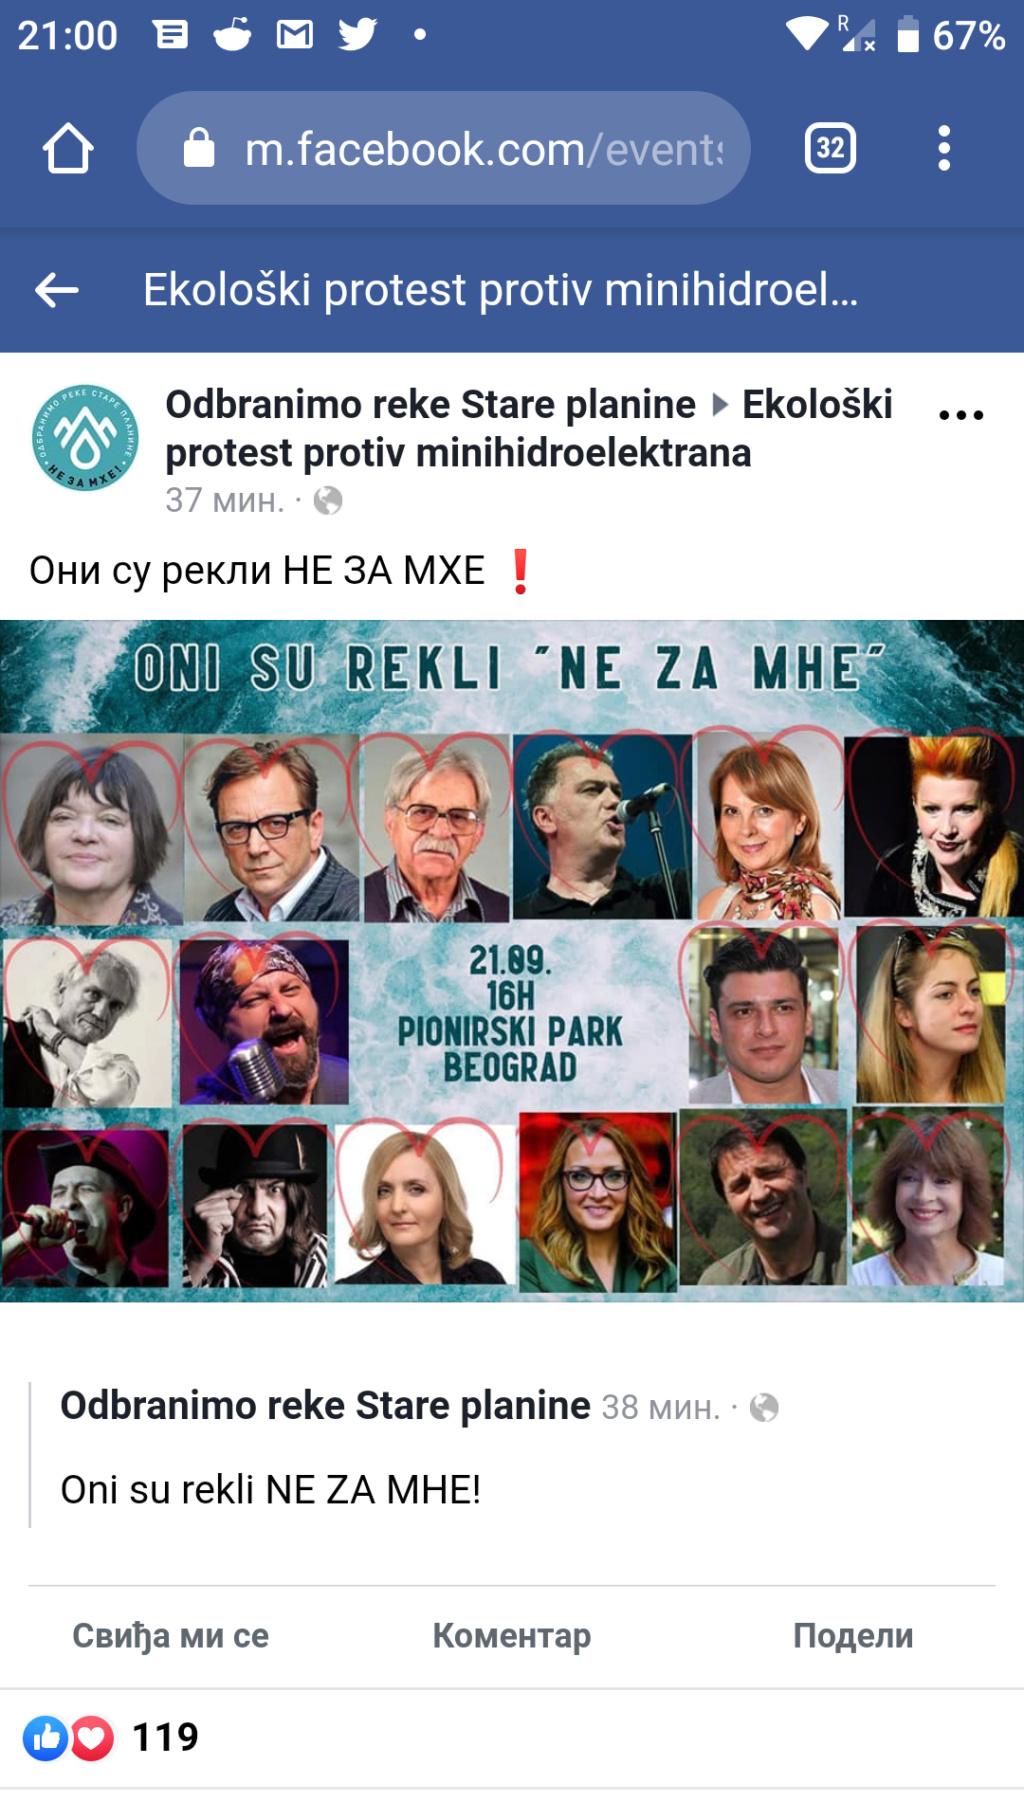 Odbranimo reke Srbije 21.9.2019. Screen10